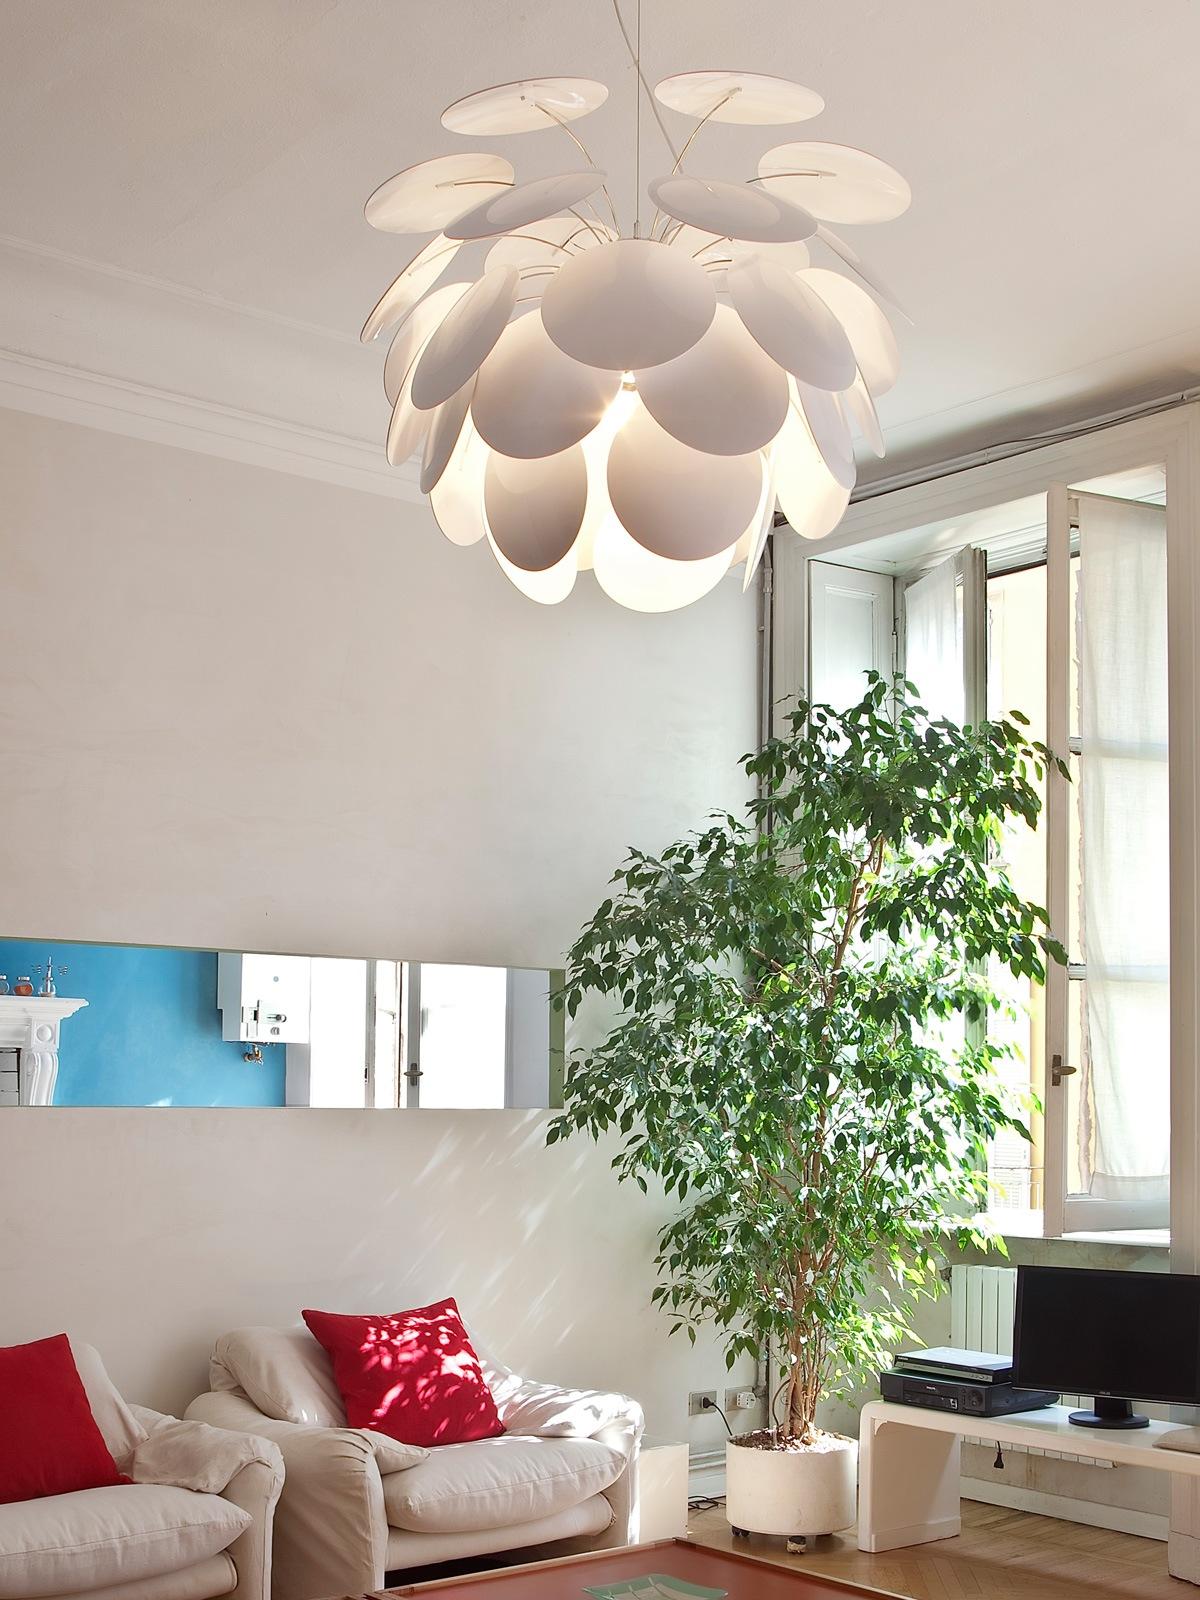 Marset Discoco Pendelleuchte Designort Lampen Onlineshop Berlin